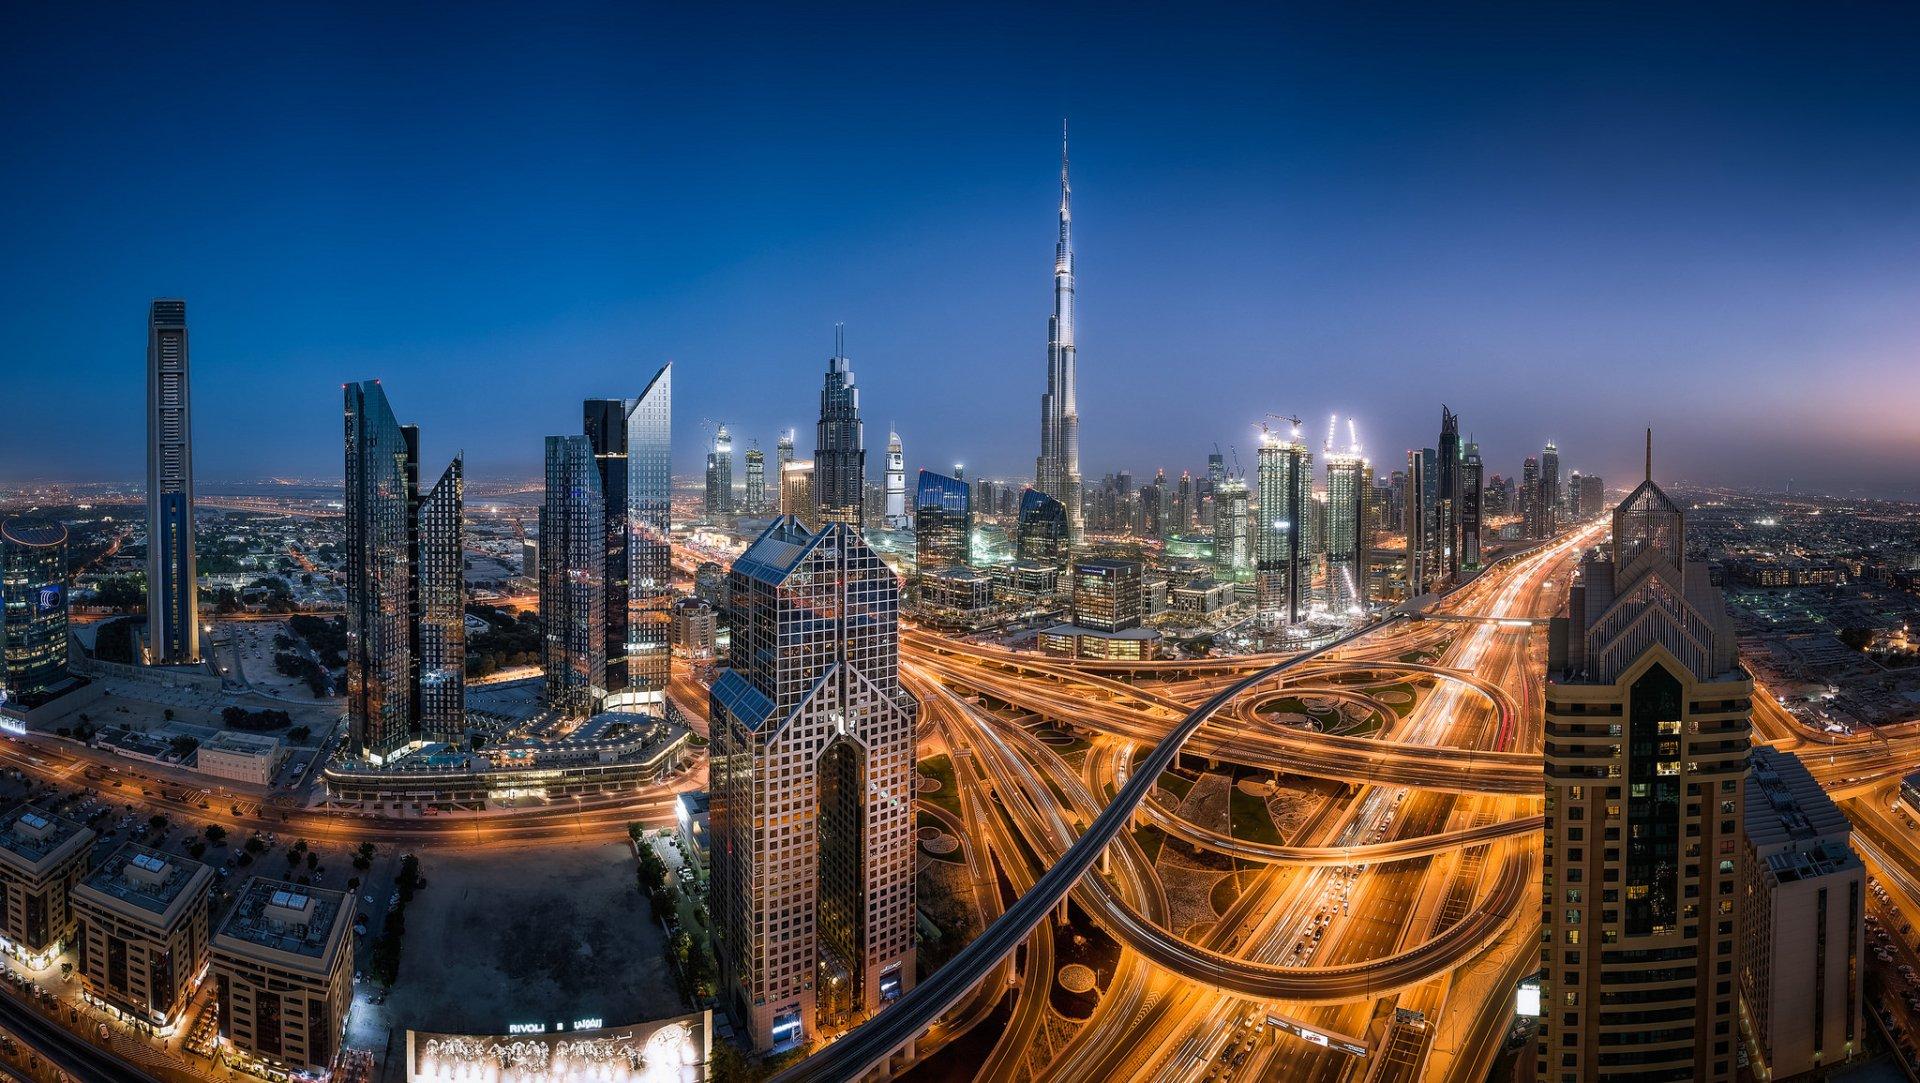 Emirates Wallpaper Hd Dubai Hd Wallpaper Background Image 2048x1155 Id